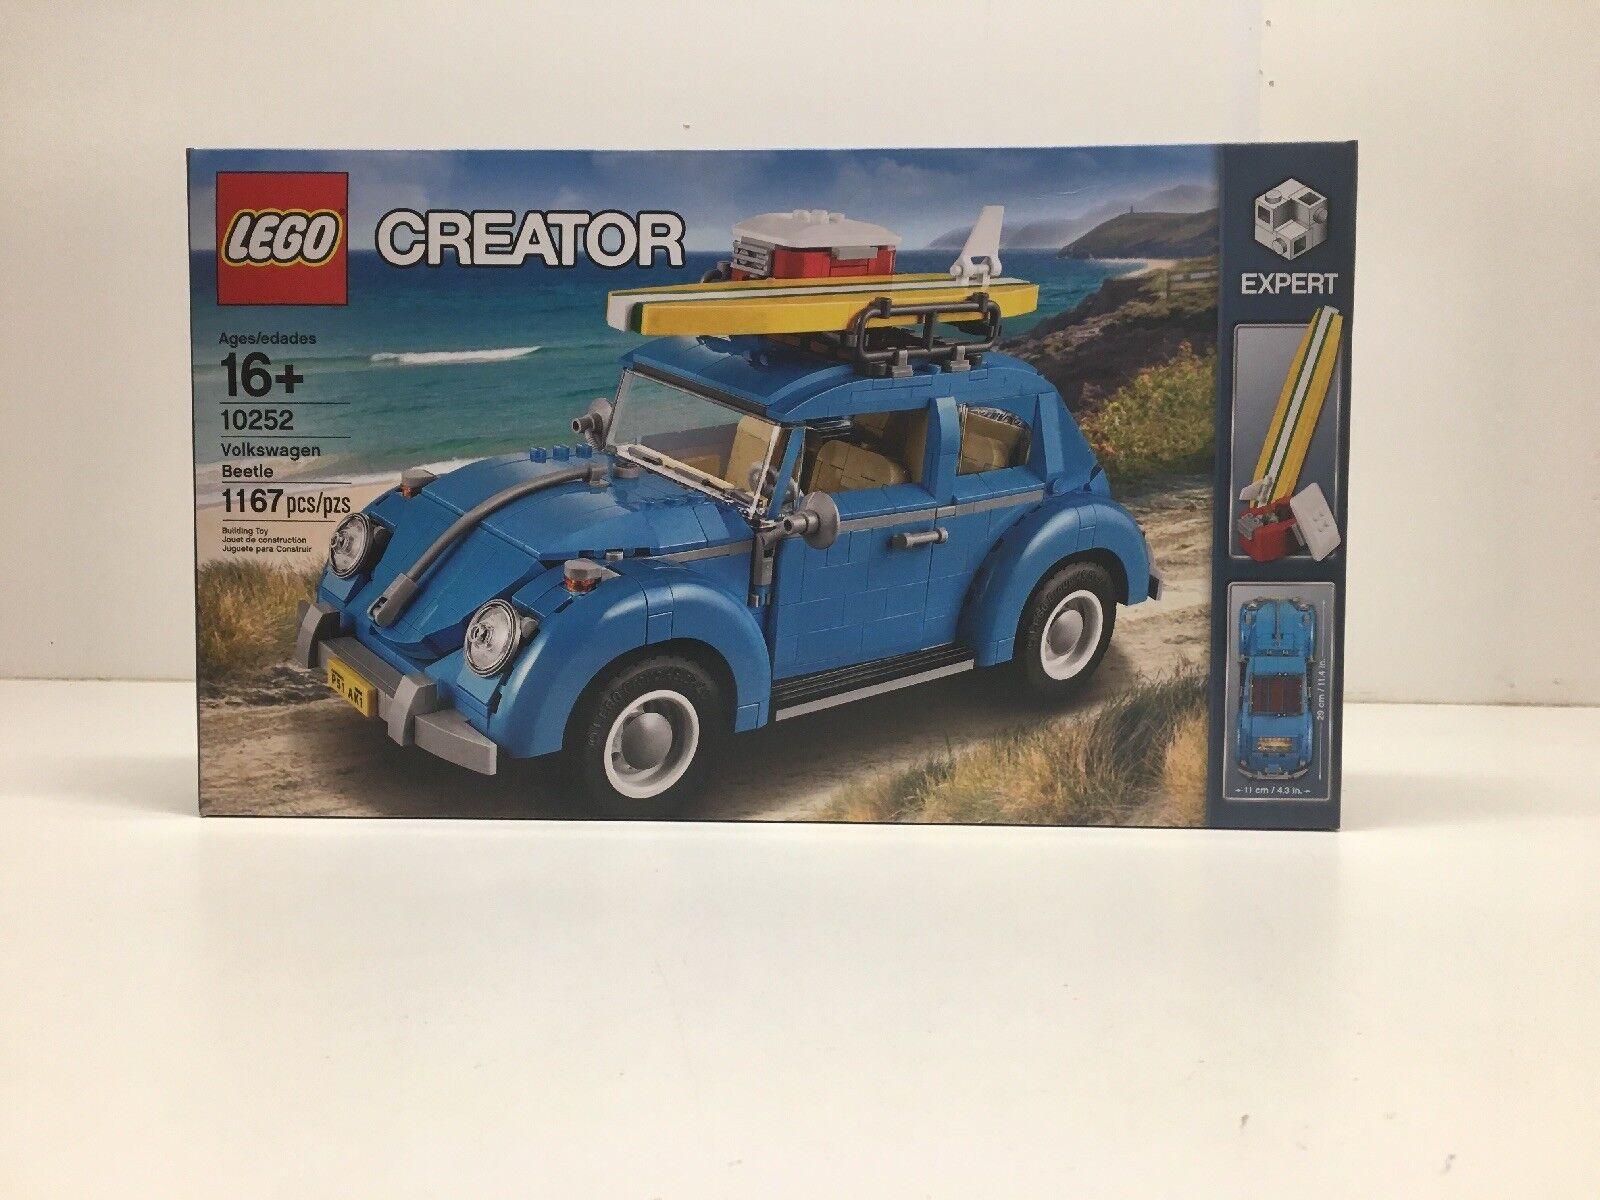 NEW NIB NIB NIB LEGO Creator 10252 Volkswagen Beetle NISB Factory Sealed NIB 4949bf